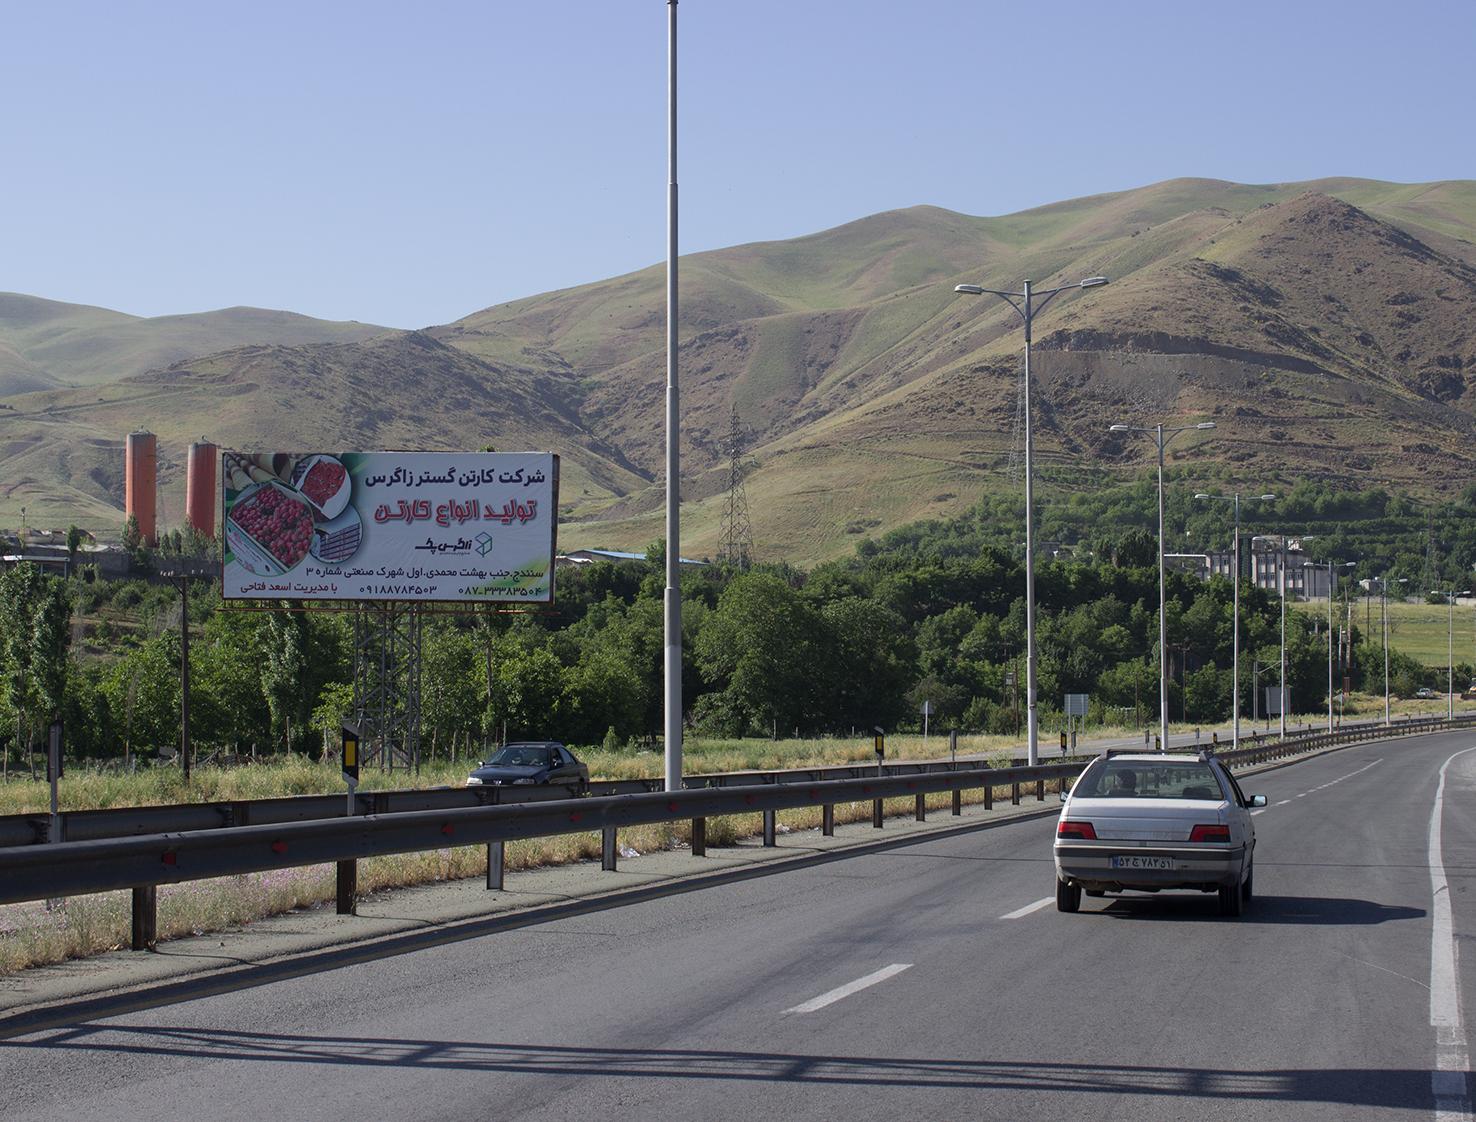 بیلبورد تبلیغاتی محور سنندج ، کرمانشاه جنب پلیس راه